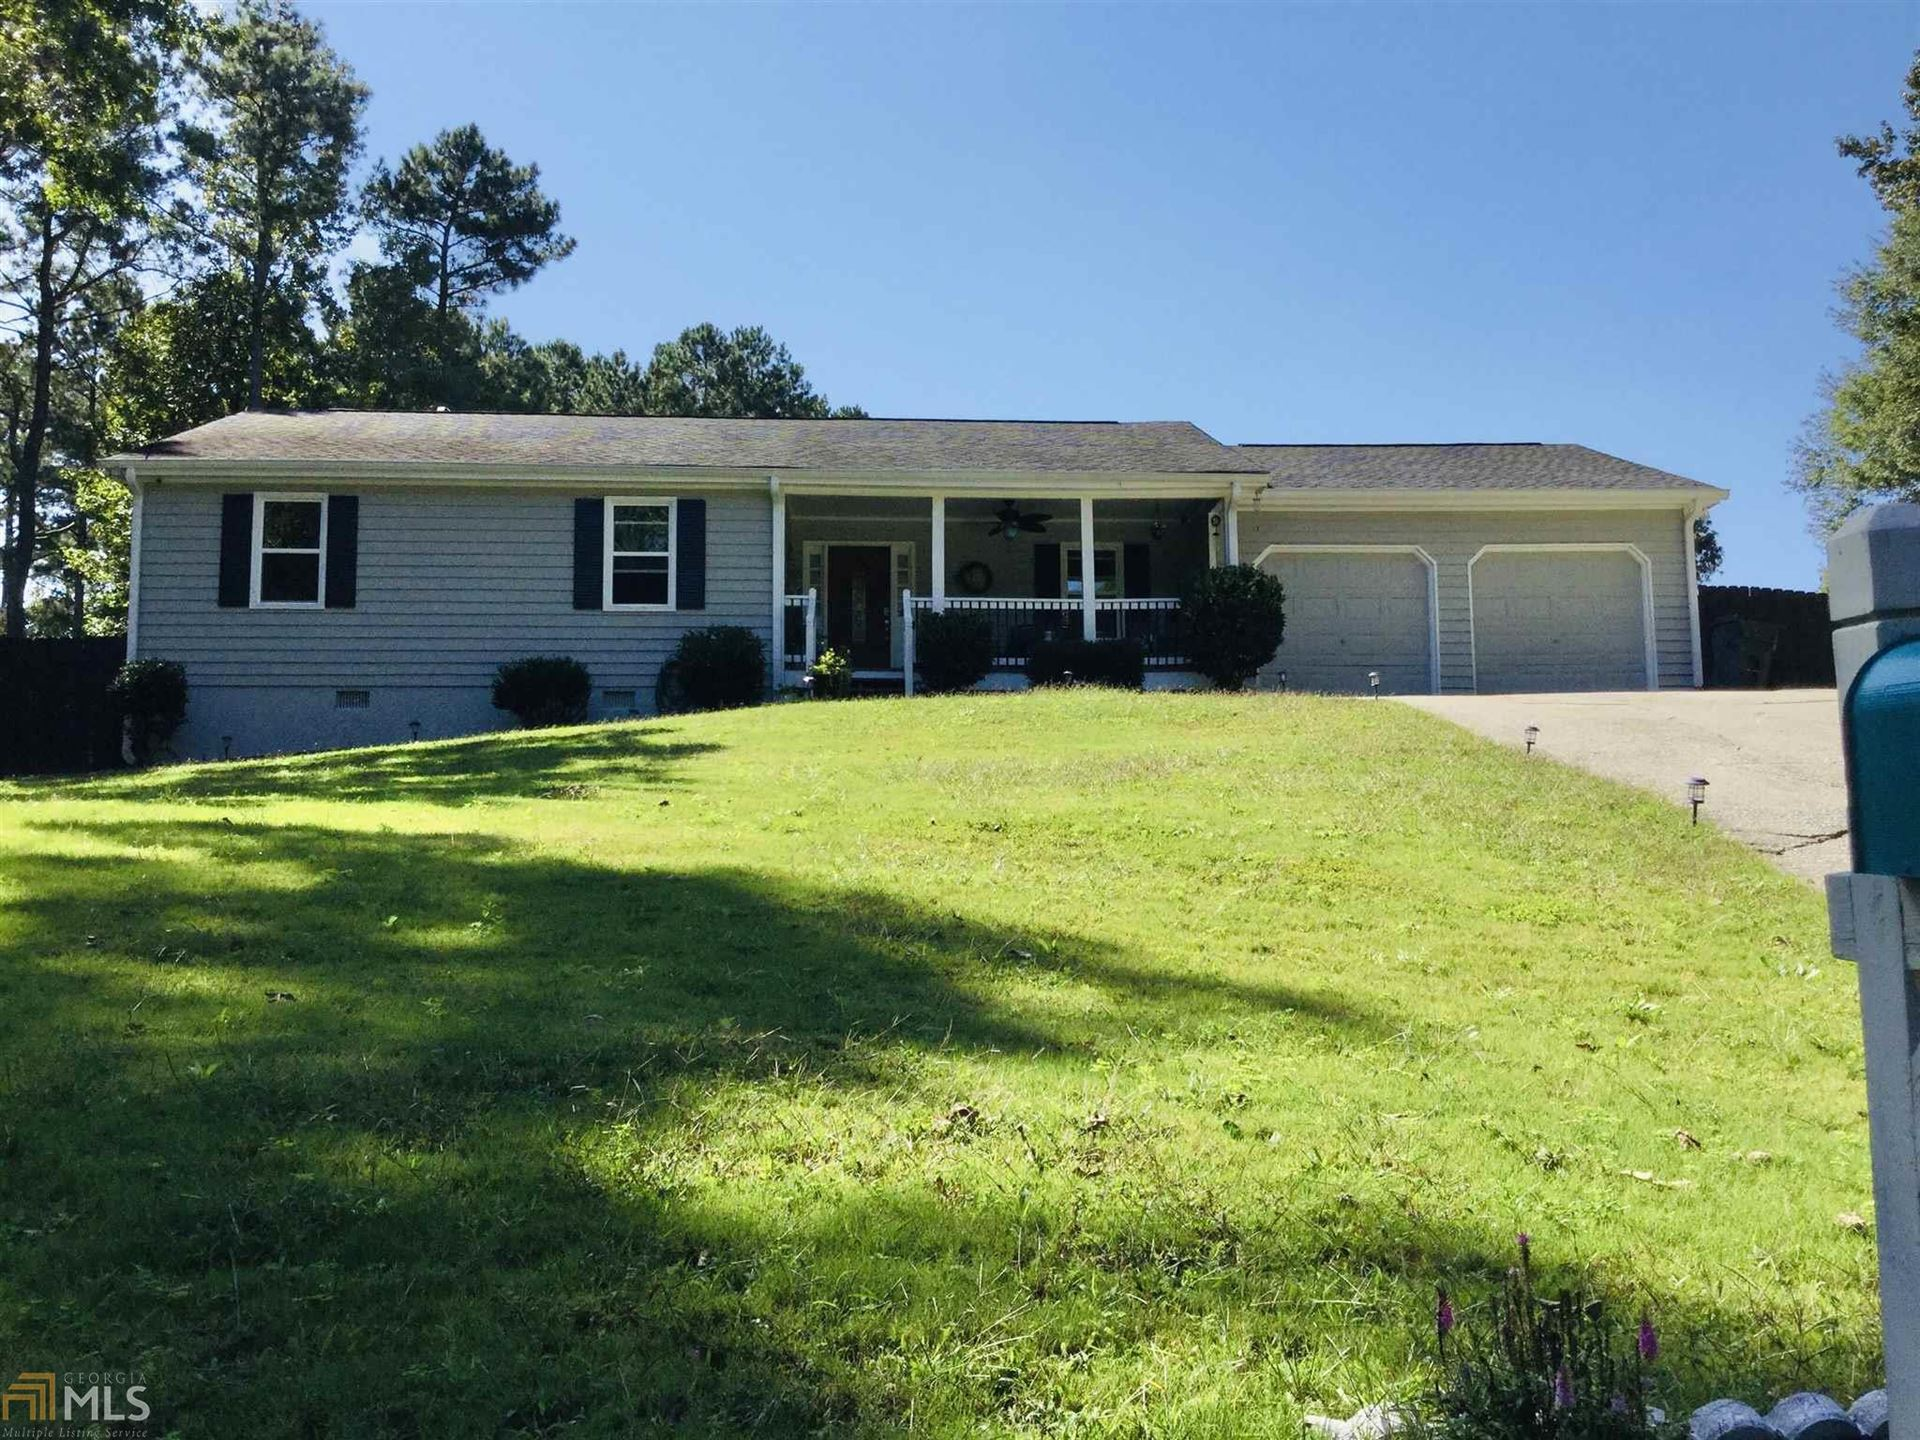 1376 Jessica, Lawrenceville, GA 30043 - #: 8870714